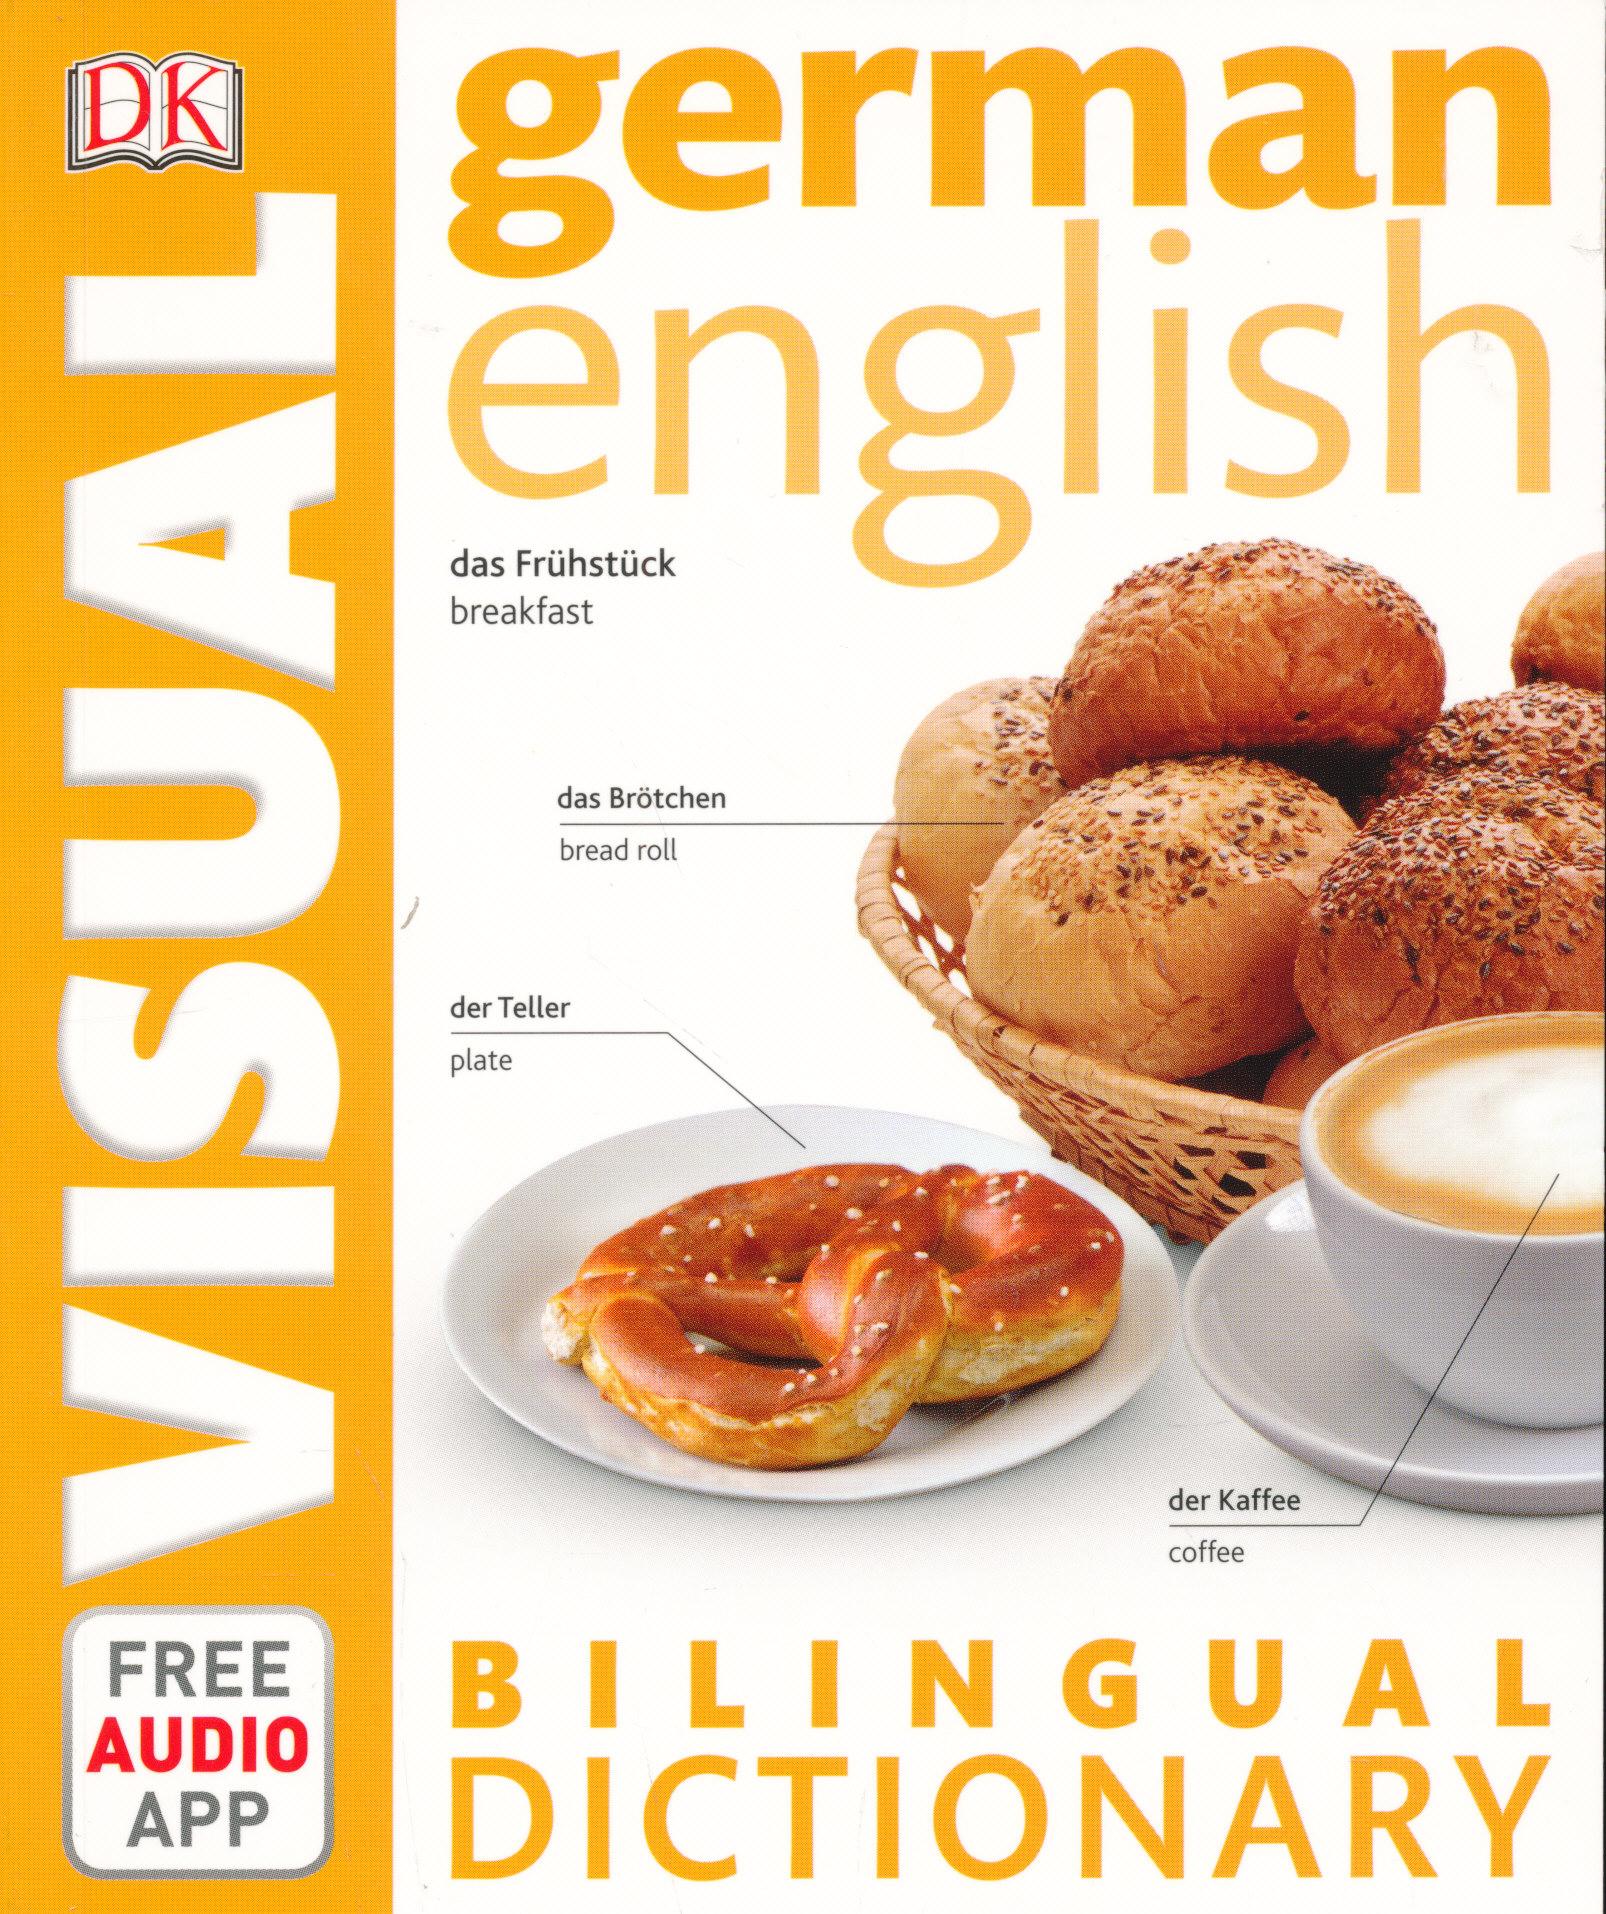 DK German-English Visual Bilingual Dictionary 2017 with Free Audio App